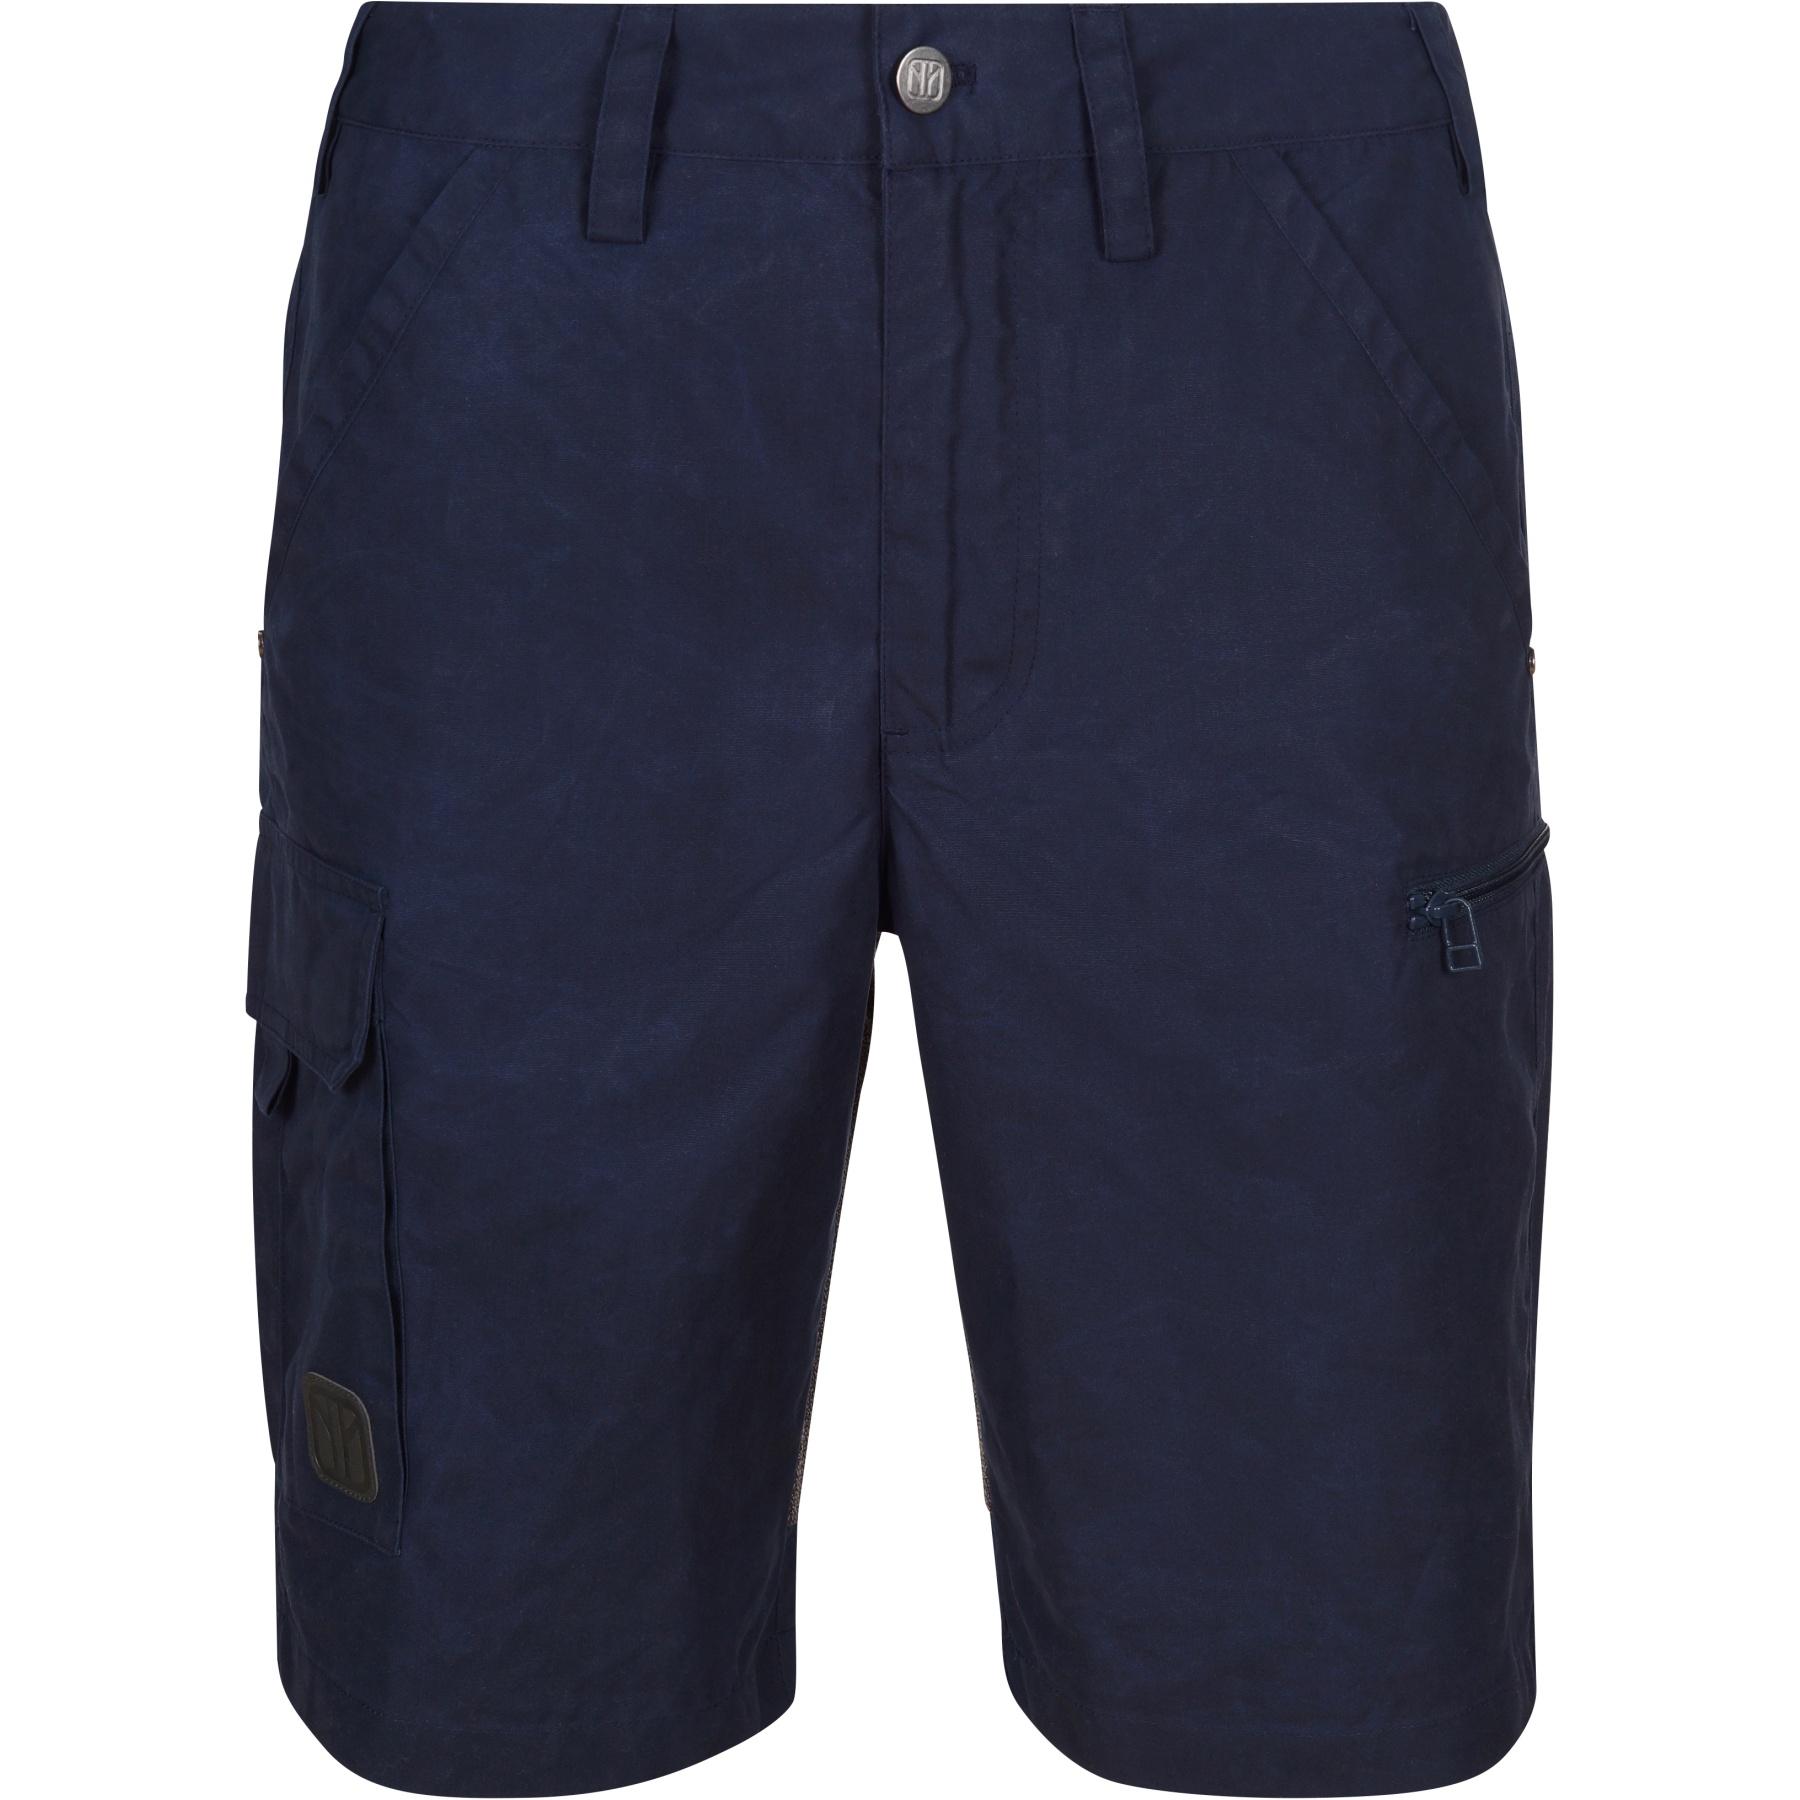 Elkline SIT UP Shorts - blueshadow